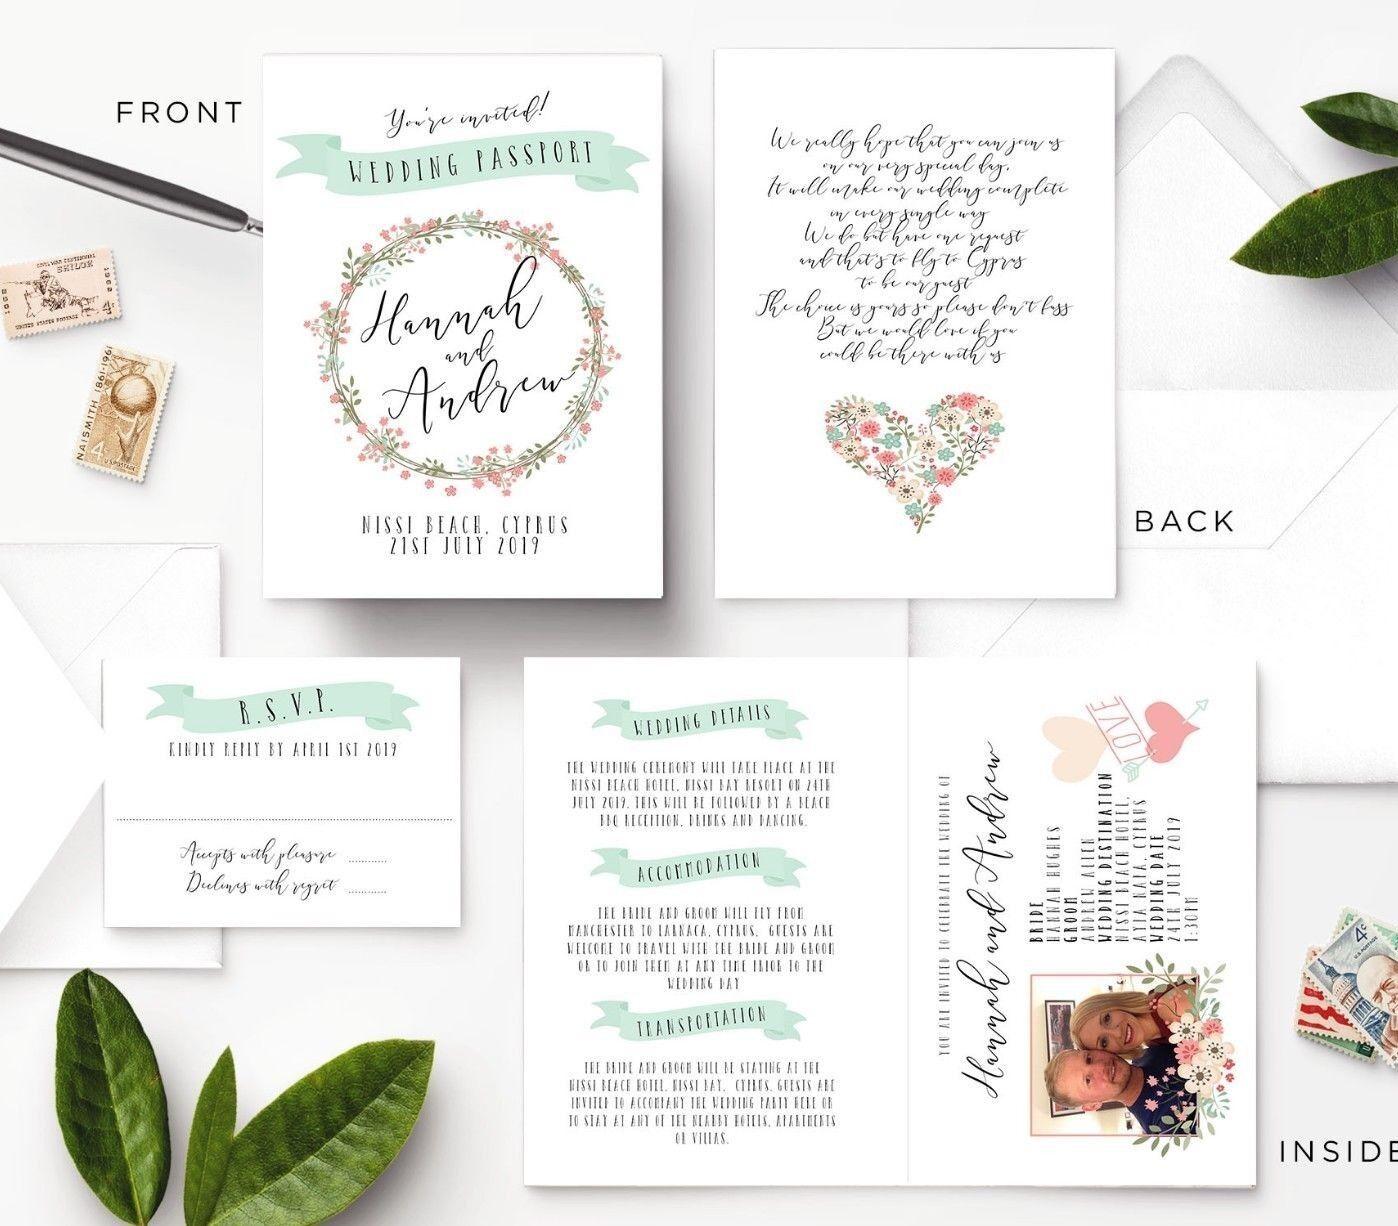 Personalised Inviti-passaporto, Wedding Day & Sera Inviti-passaporto, Personalised DESTINAZIONE, Viaggi 1c5890